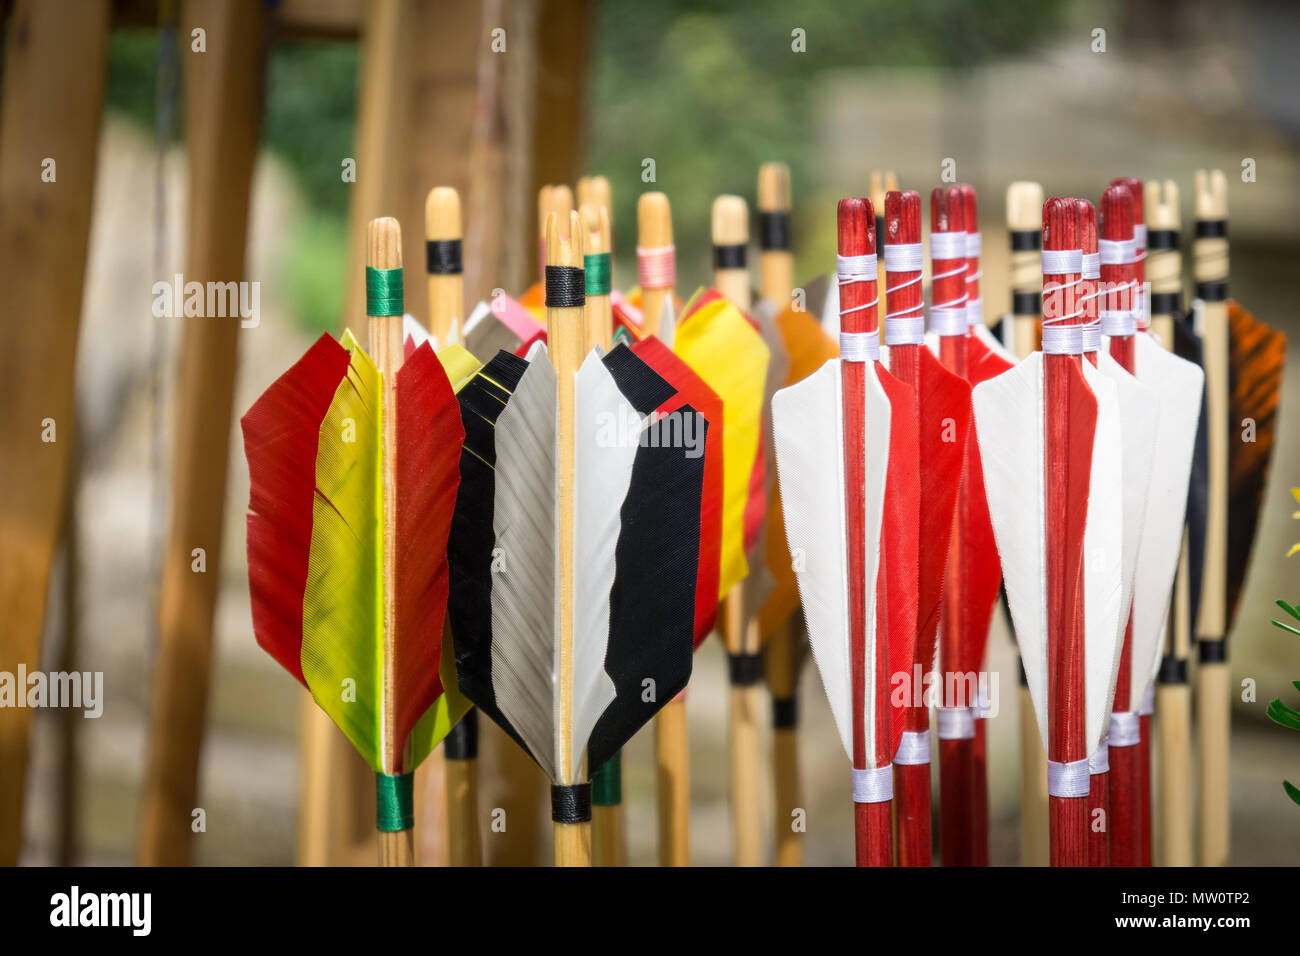 Handmade Arrows - handgemachte Pfeile - for archery - Stock Image